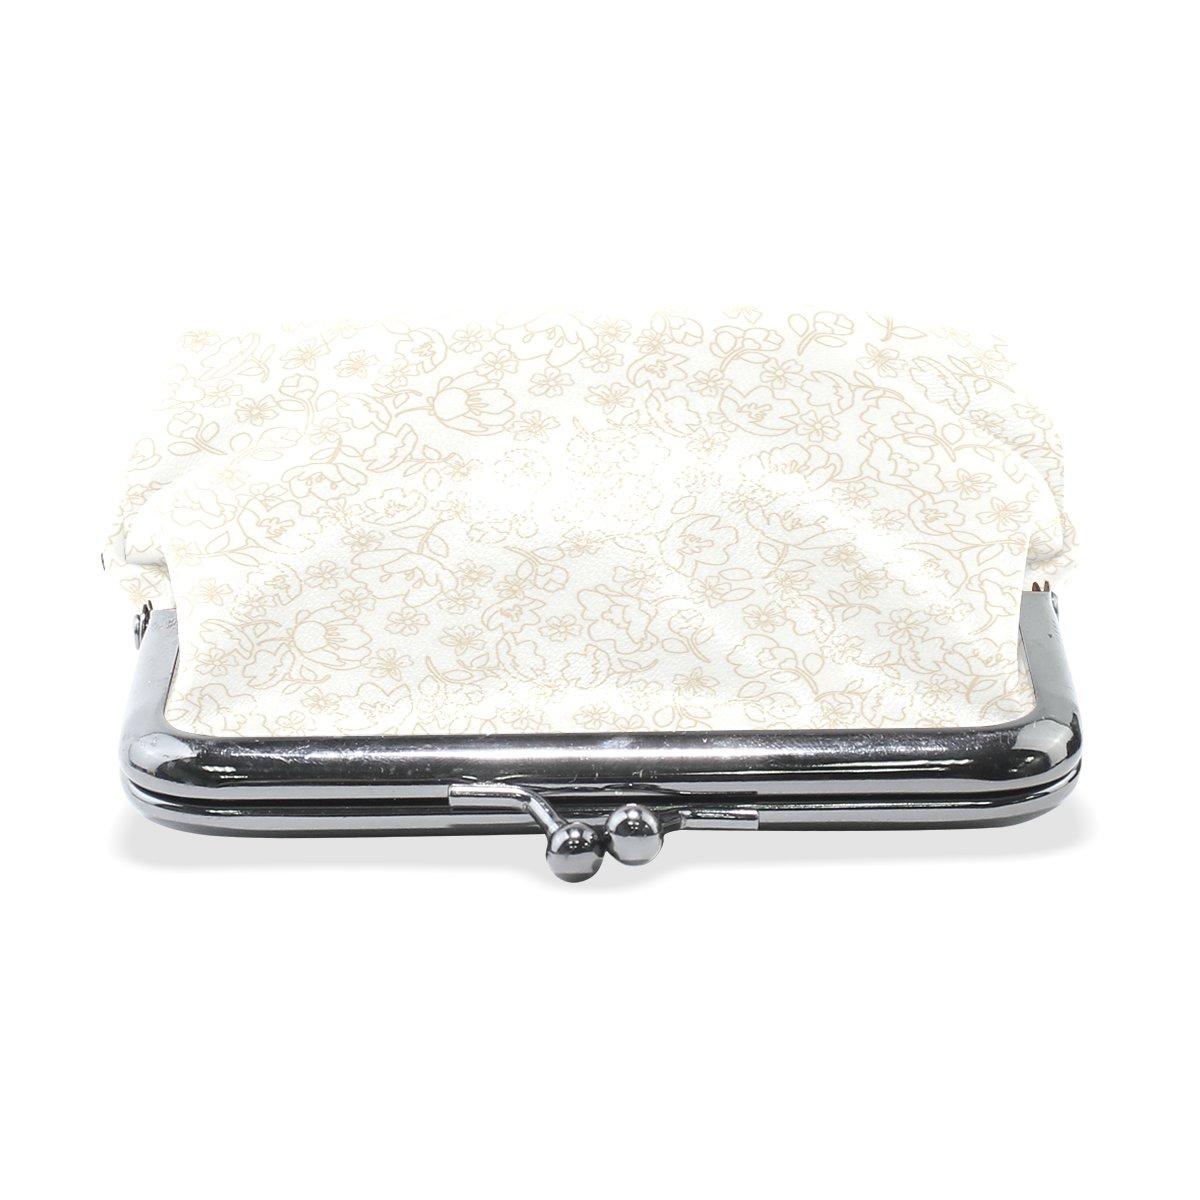 Coin Purse Flower Floral Cloth Wallet Buckle Clutch Handbag For Women Girls Gift